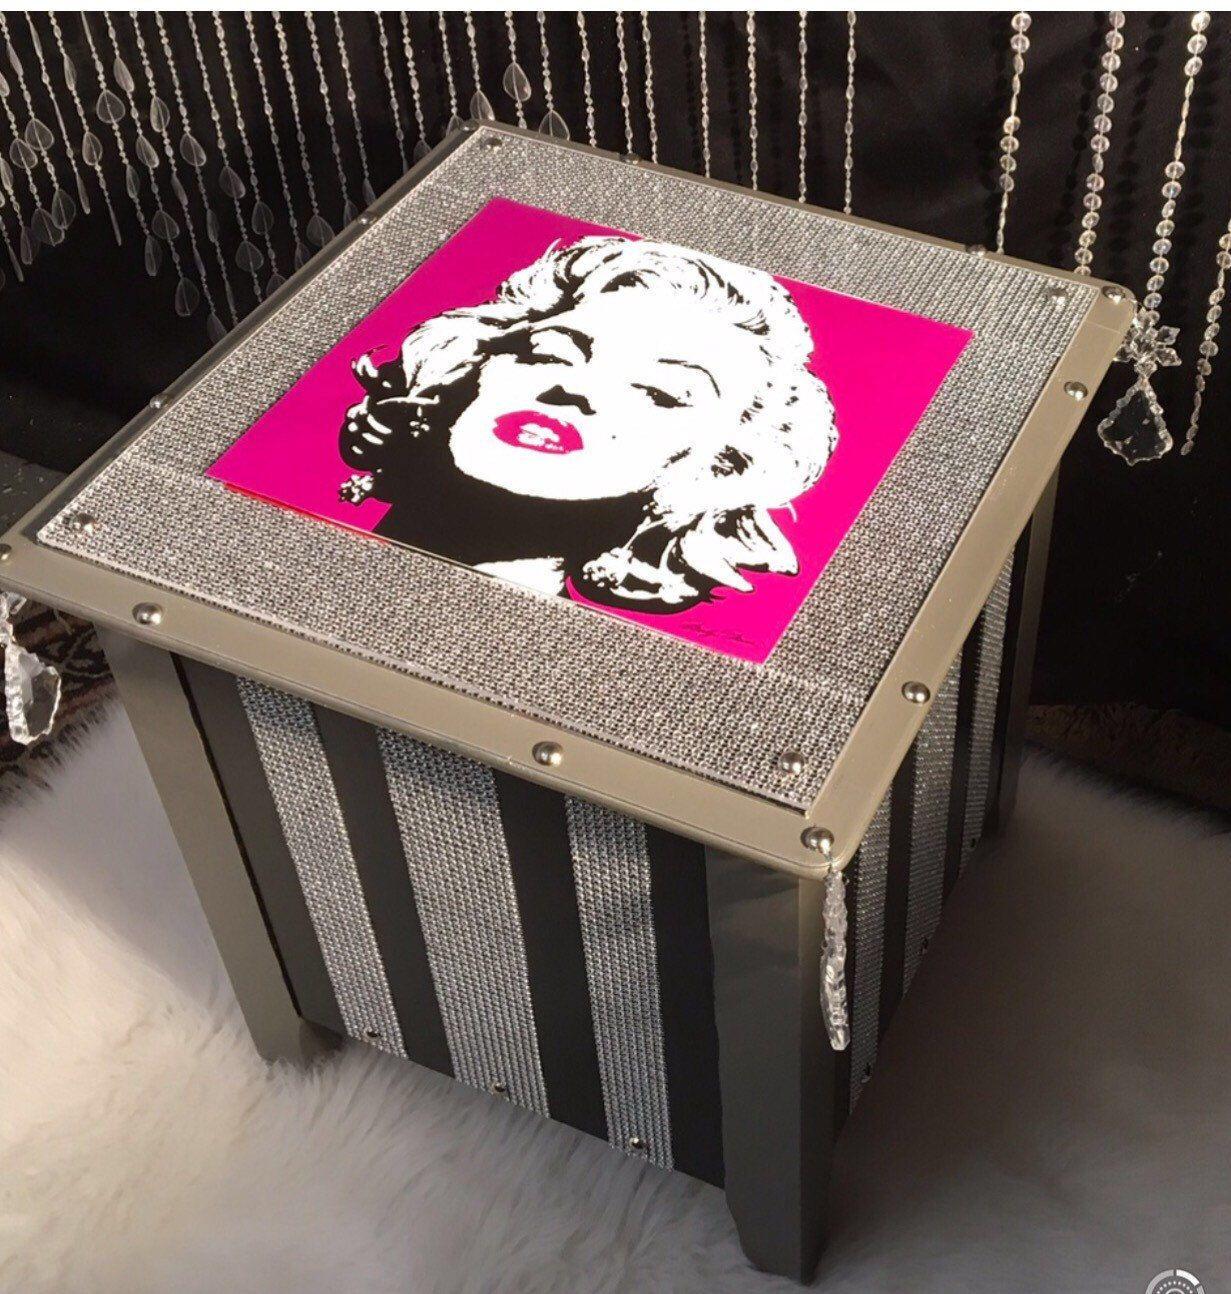 Marilyn Monroe Marilyn Monroe decor elvis presley norma ...